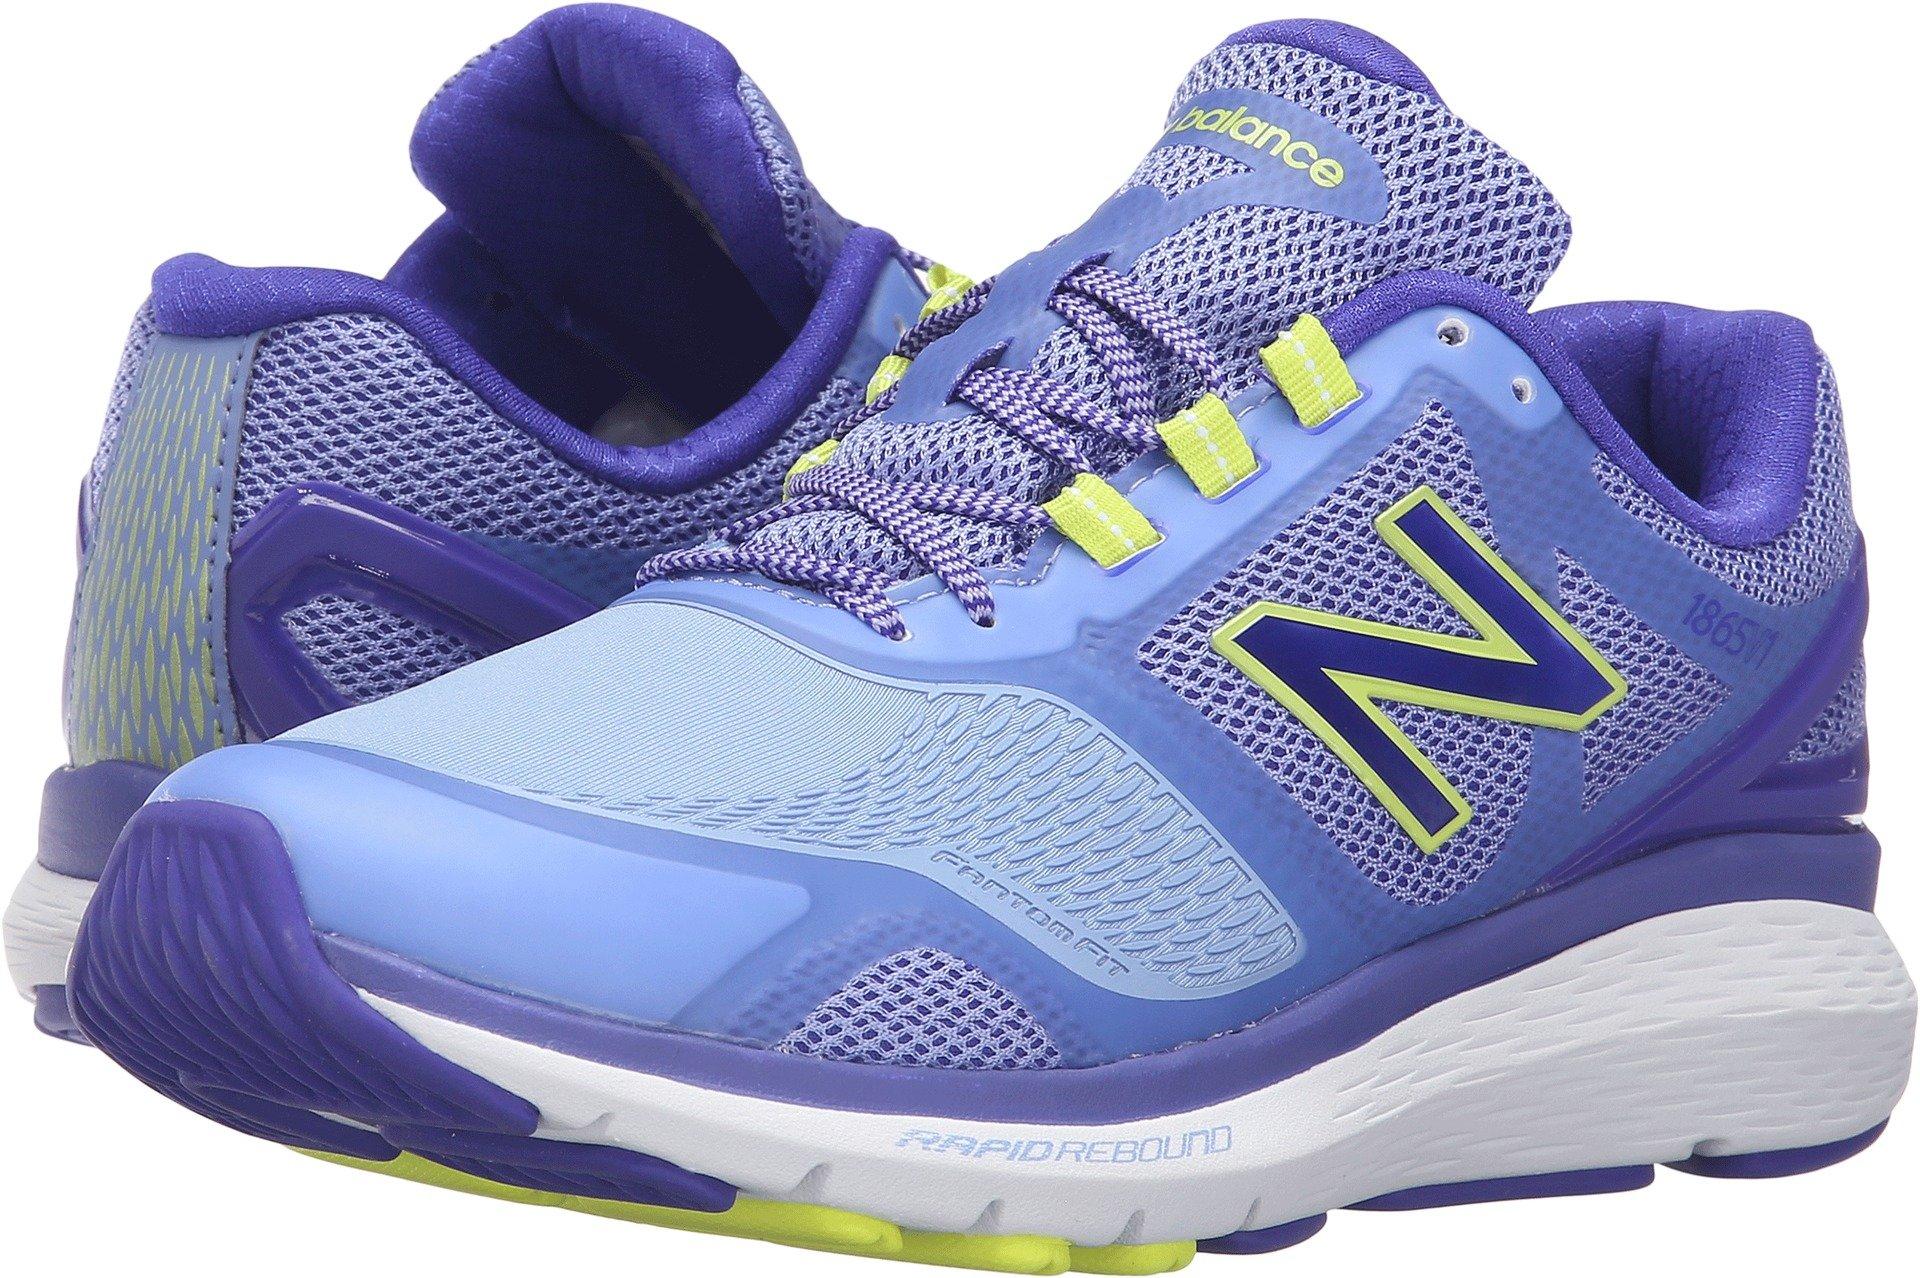 New Balance Women's 1865v1 Trail Walking Shoe, Purple, 6.5 B US